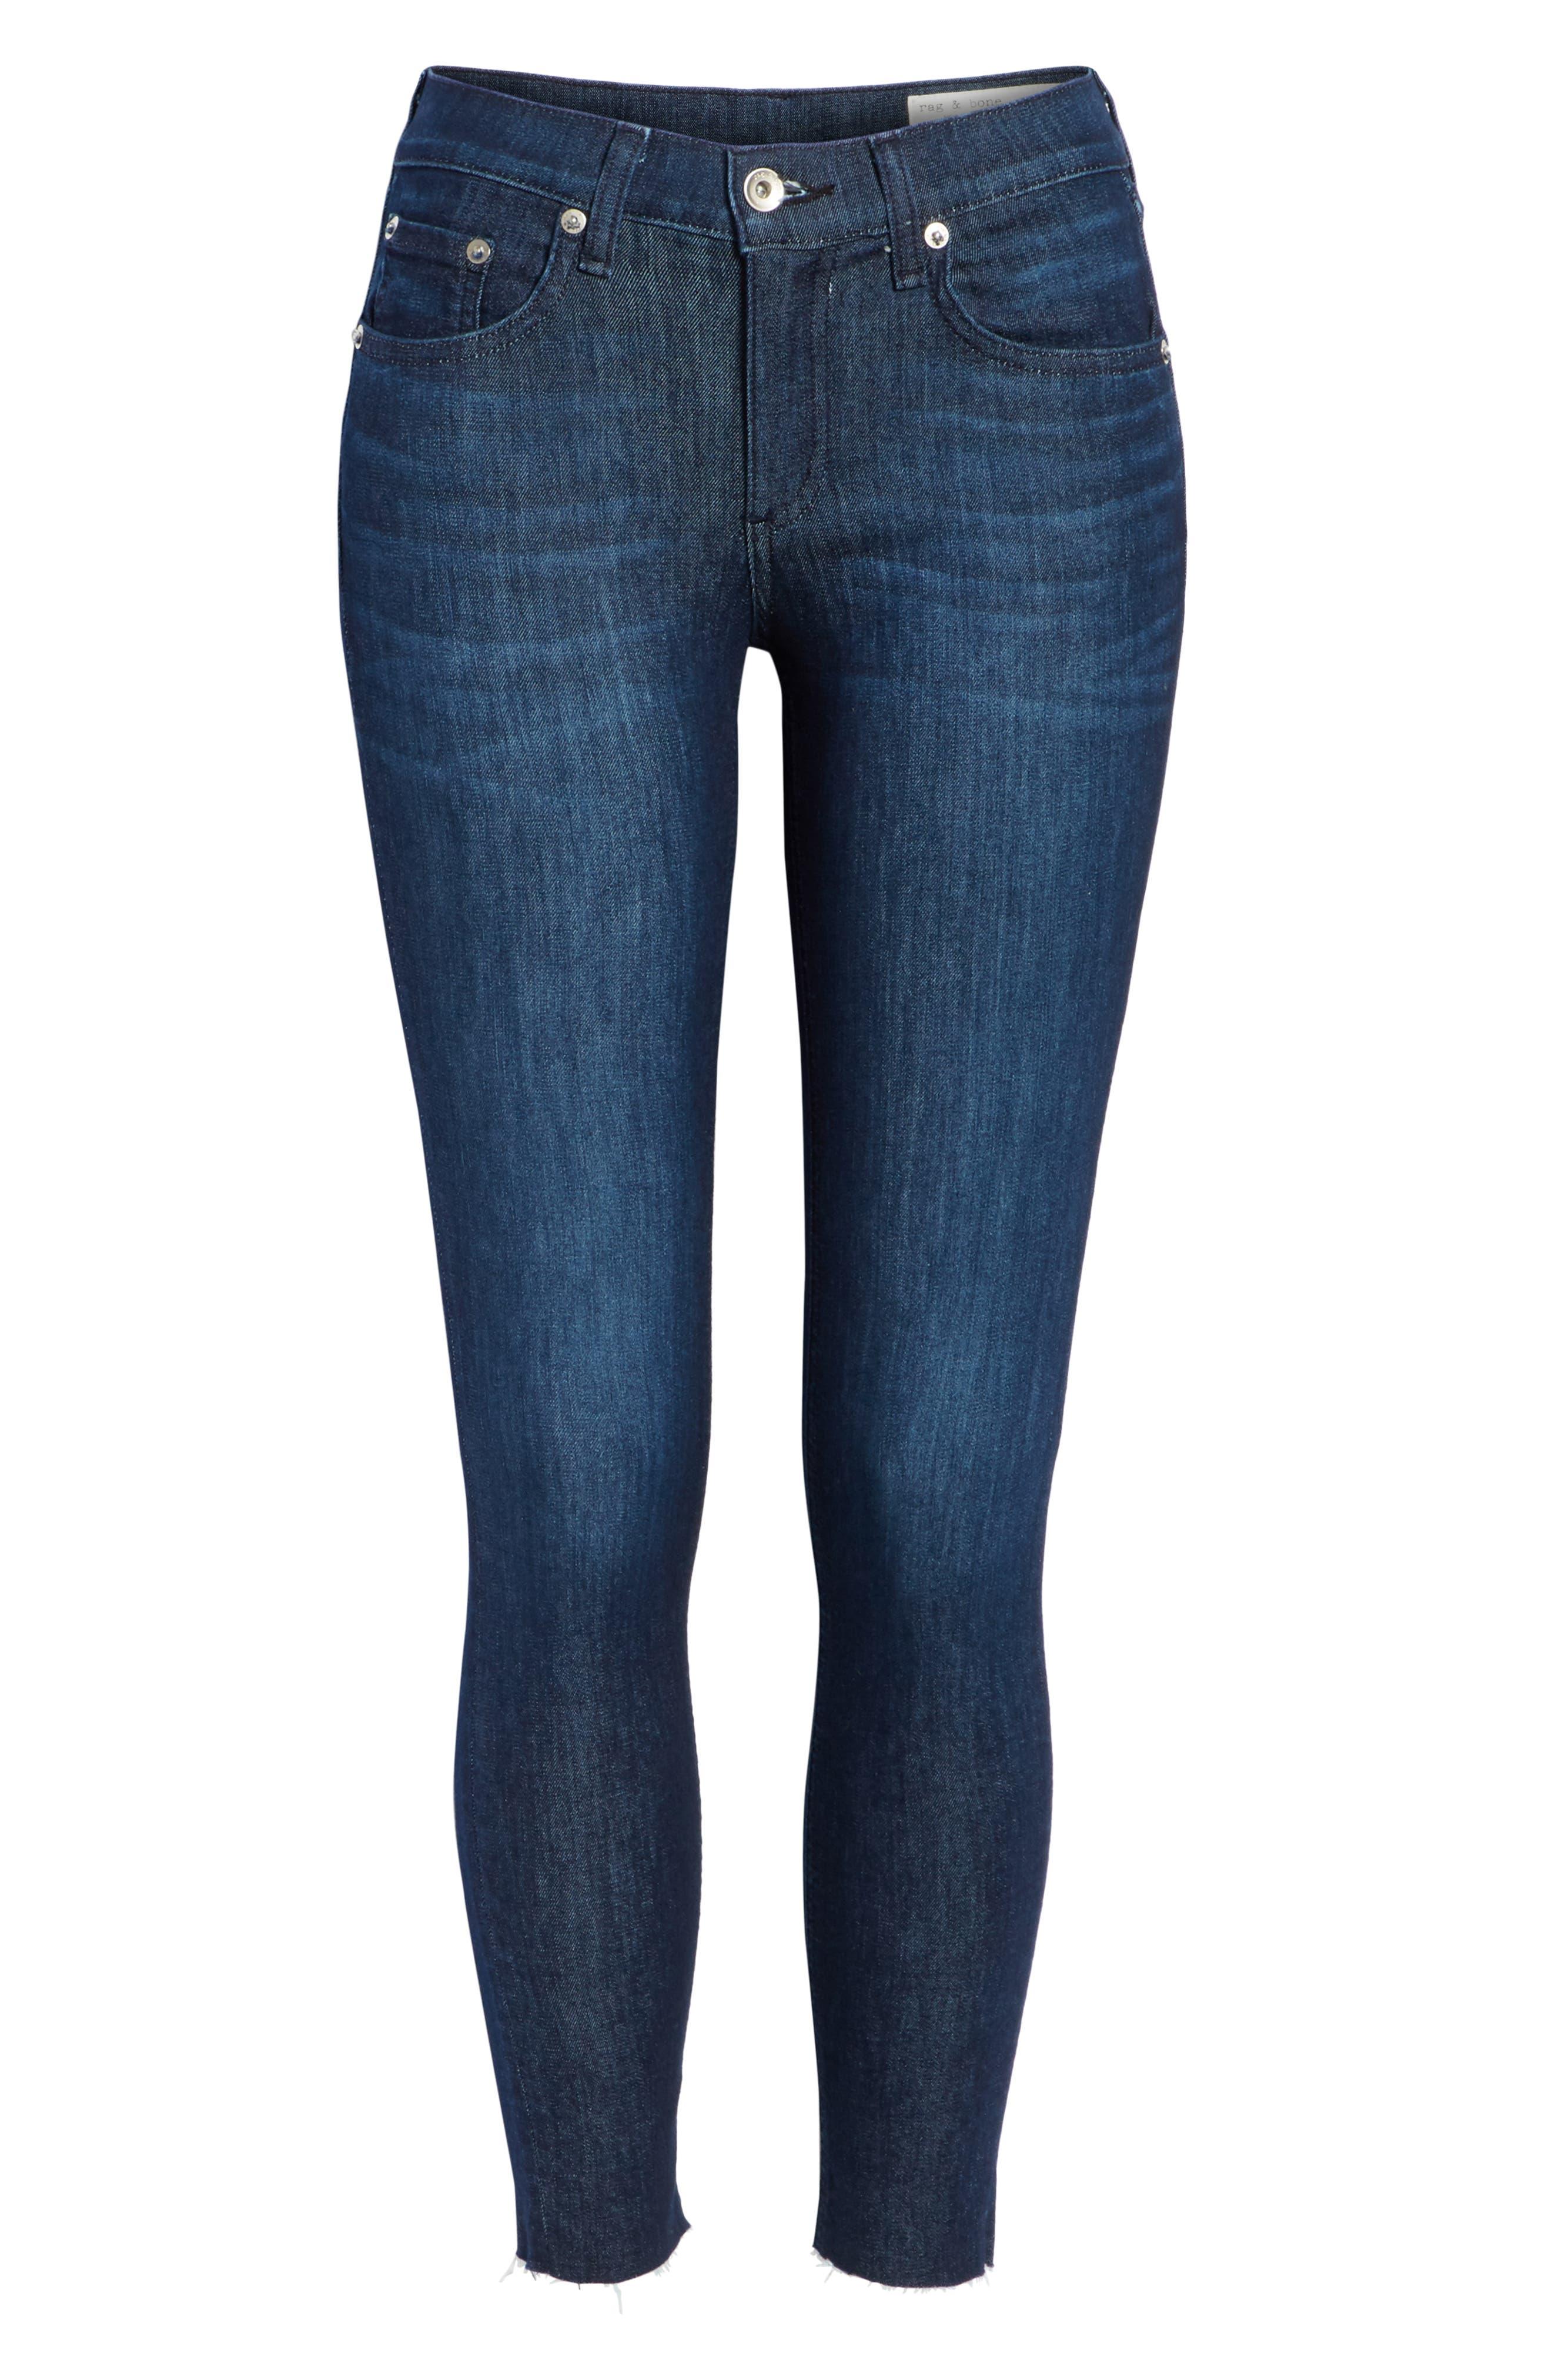 RAG & BONE, Raw Hem Ankle Skinny Jeans, Alternate thumbnail 7, color, TONAL RIVER